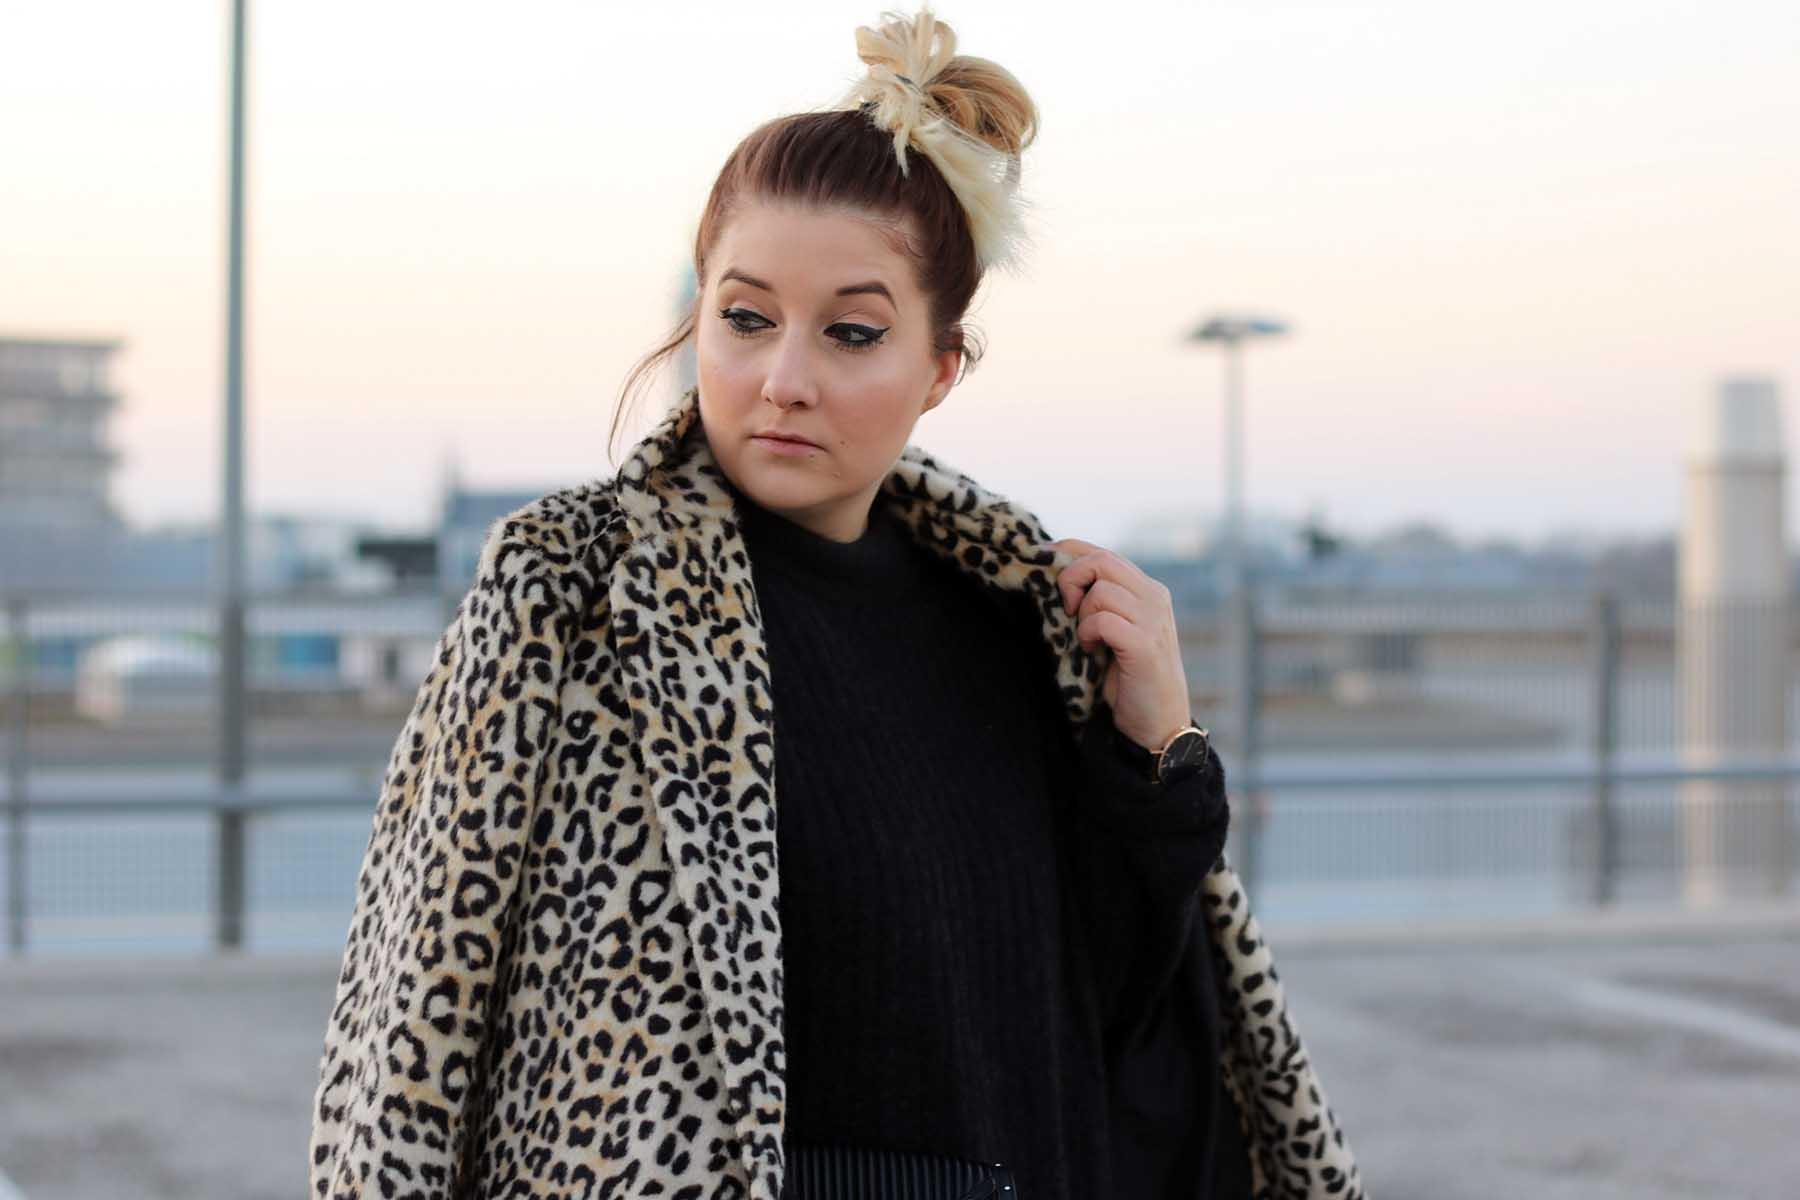 outift-leomantel-mantel-winter-leoparden-modeblog-fashionblog-look-braunschweig20